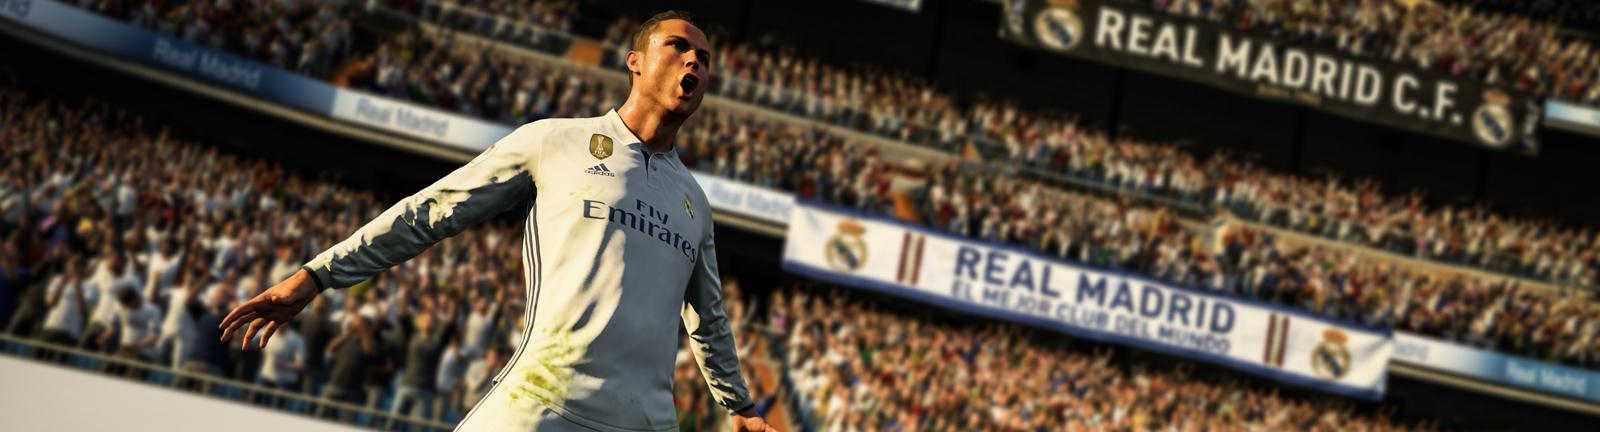 Die FIFA 18 Version von Cristiano Ronaldo